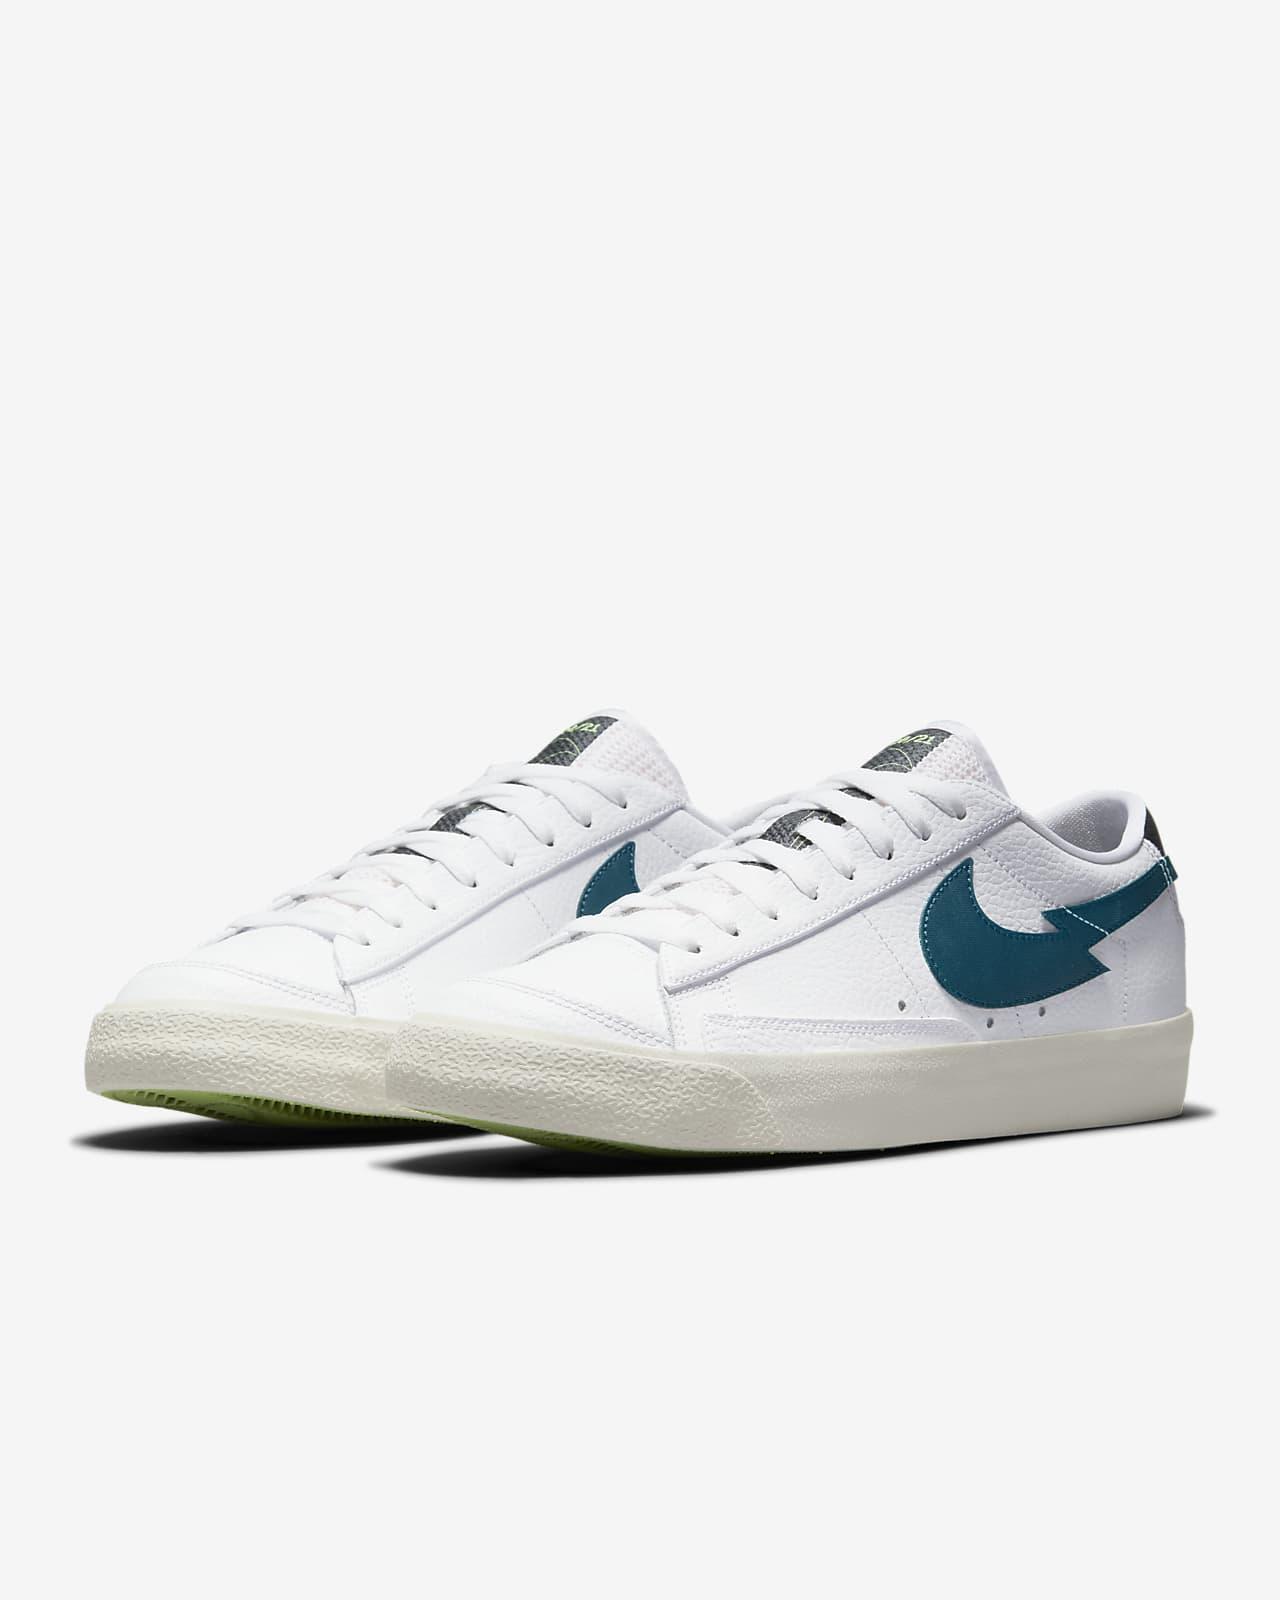 Nike Blazer Low '77 Shoe. Nike LU